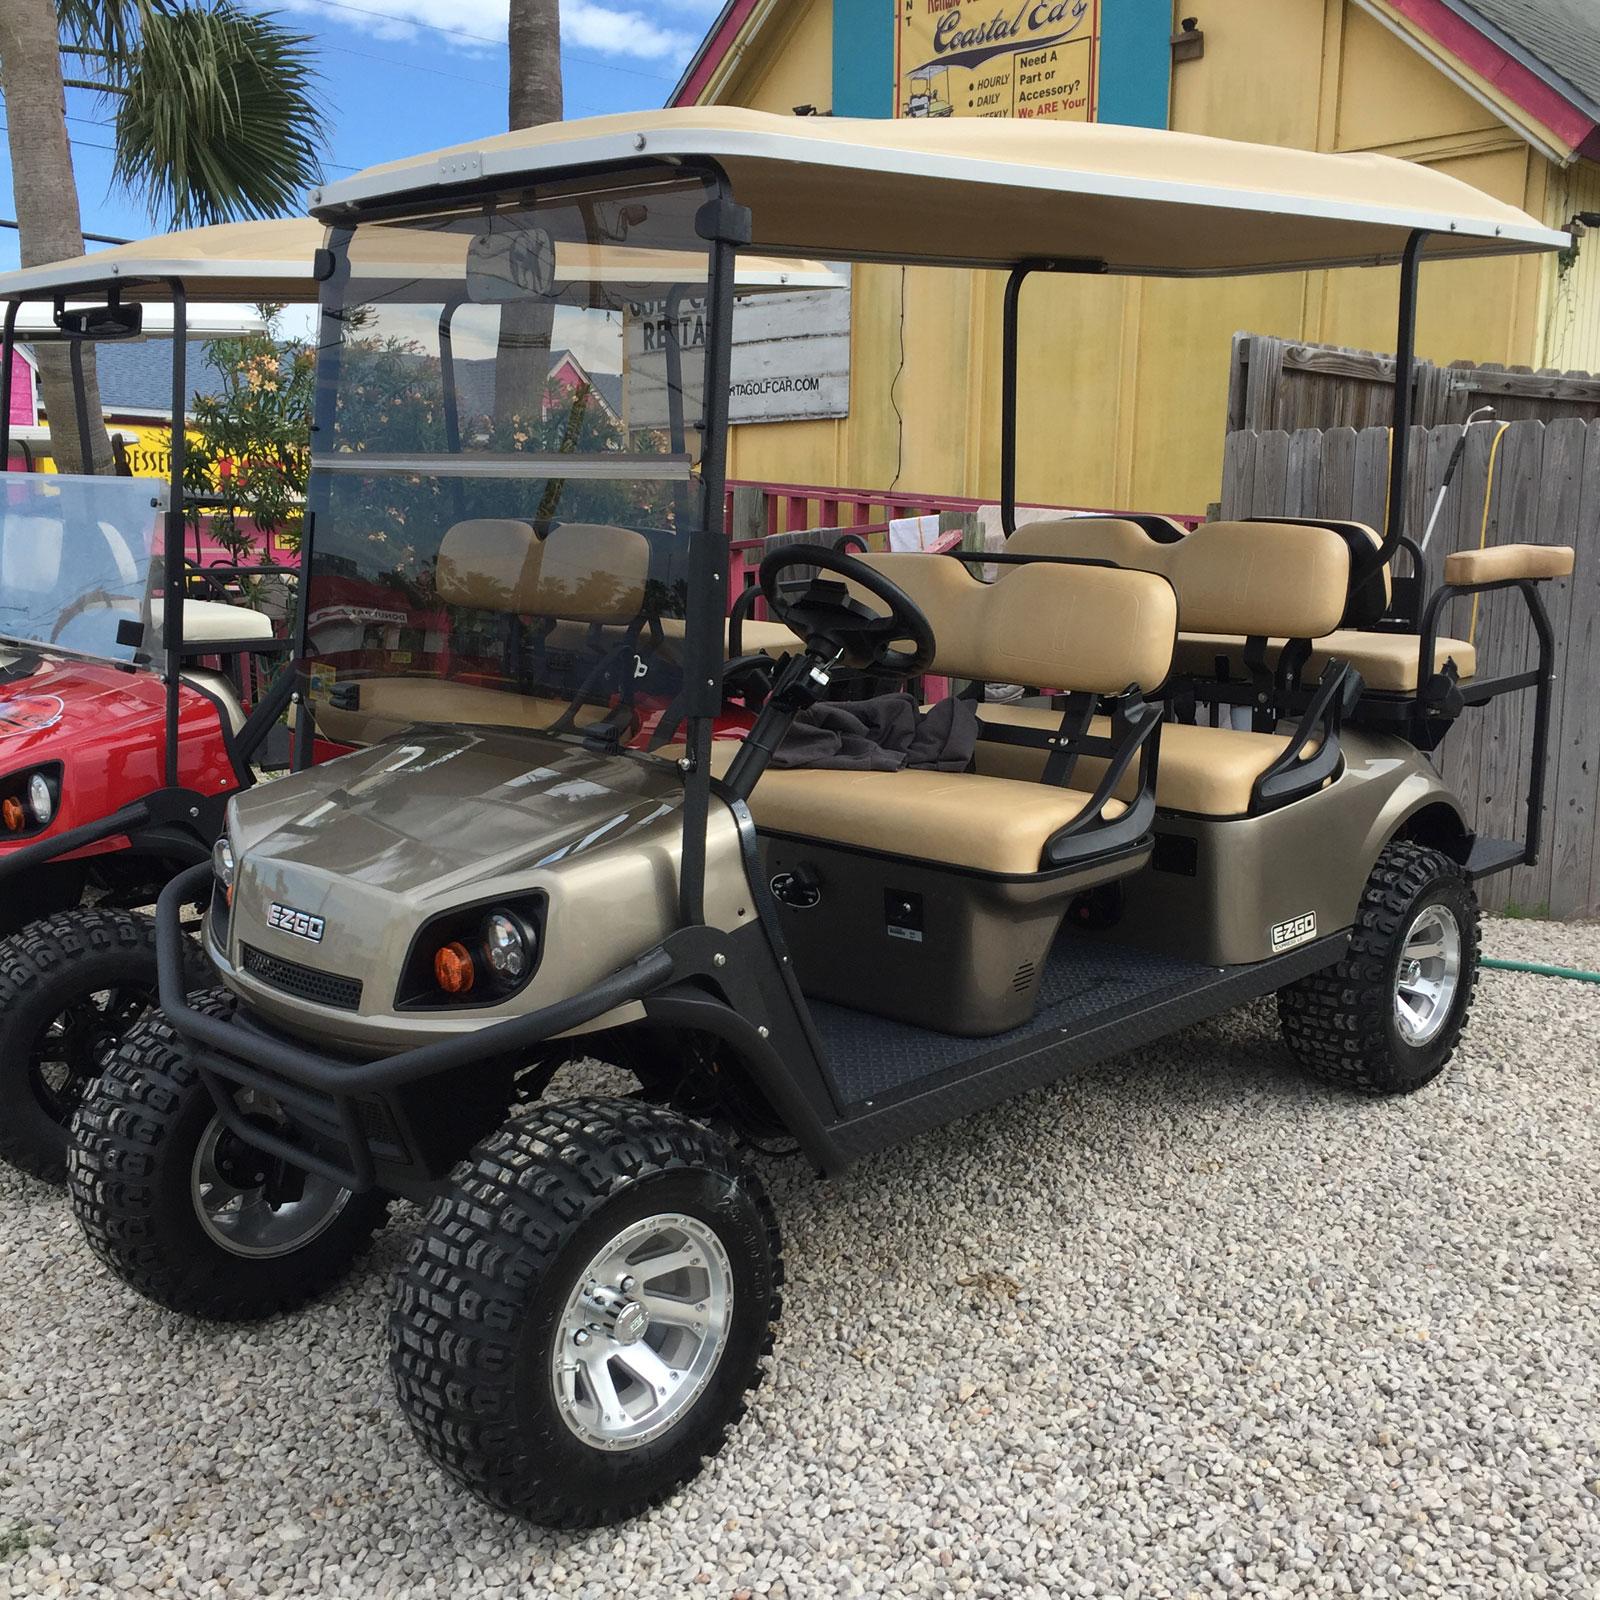 Almond EZGO Golf Car